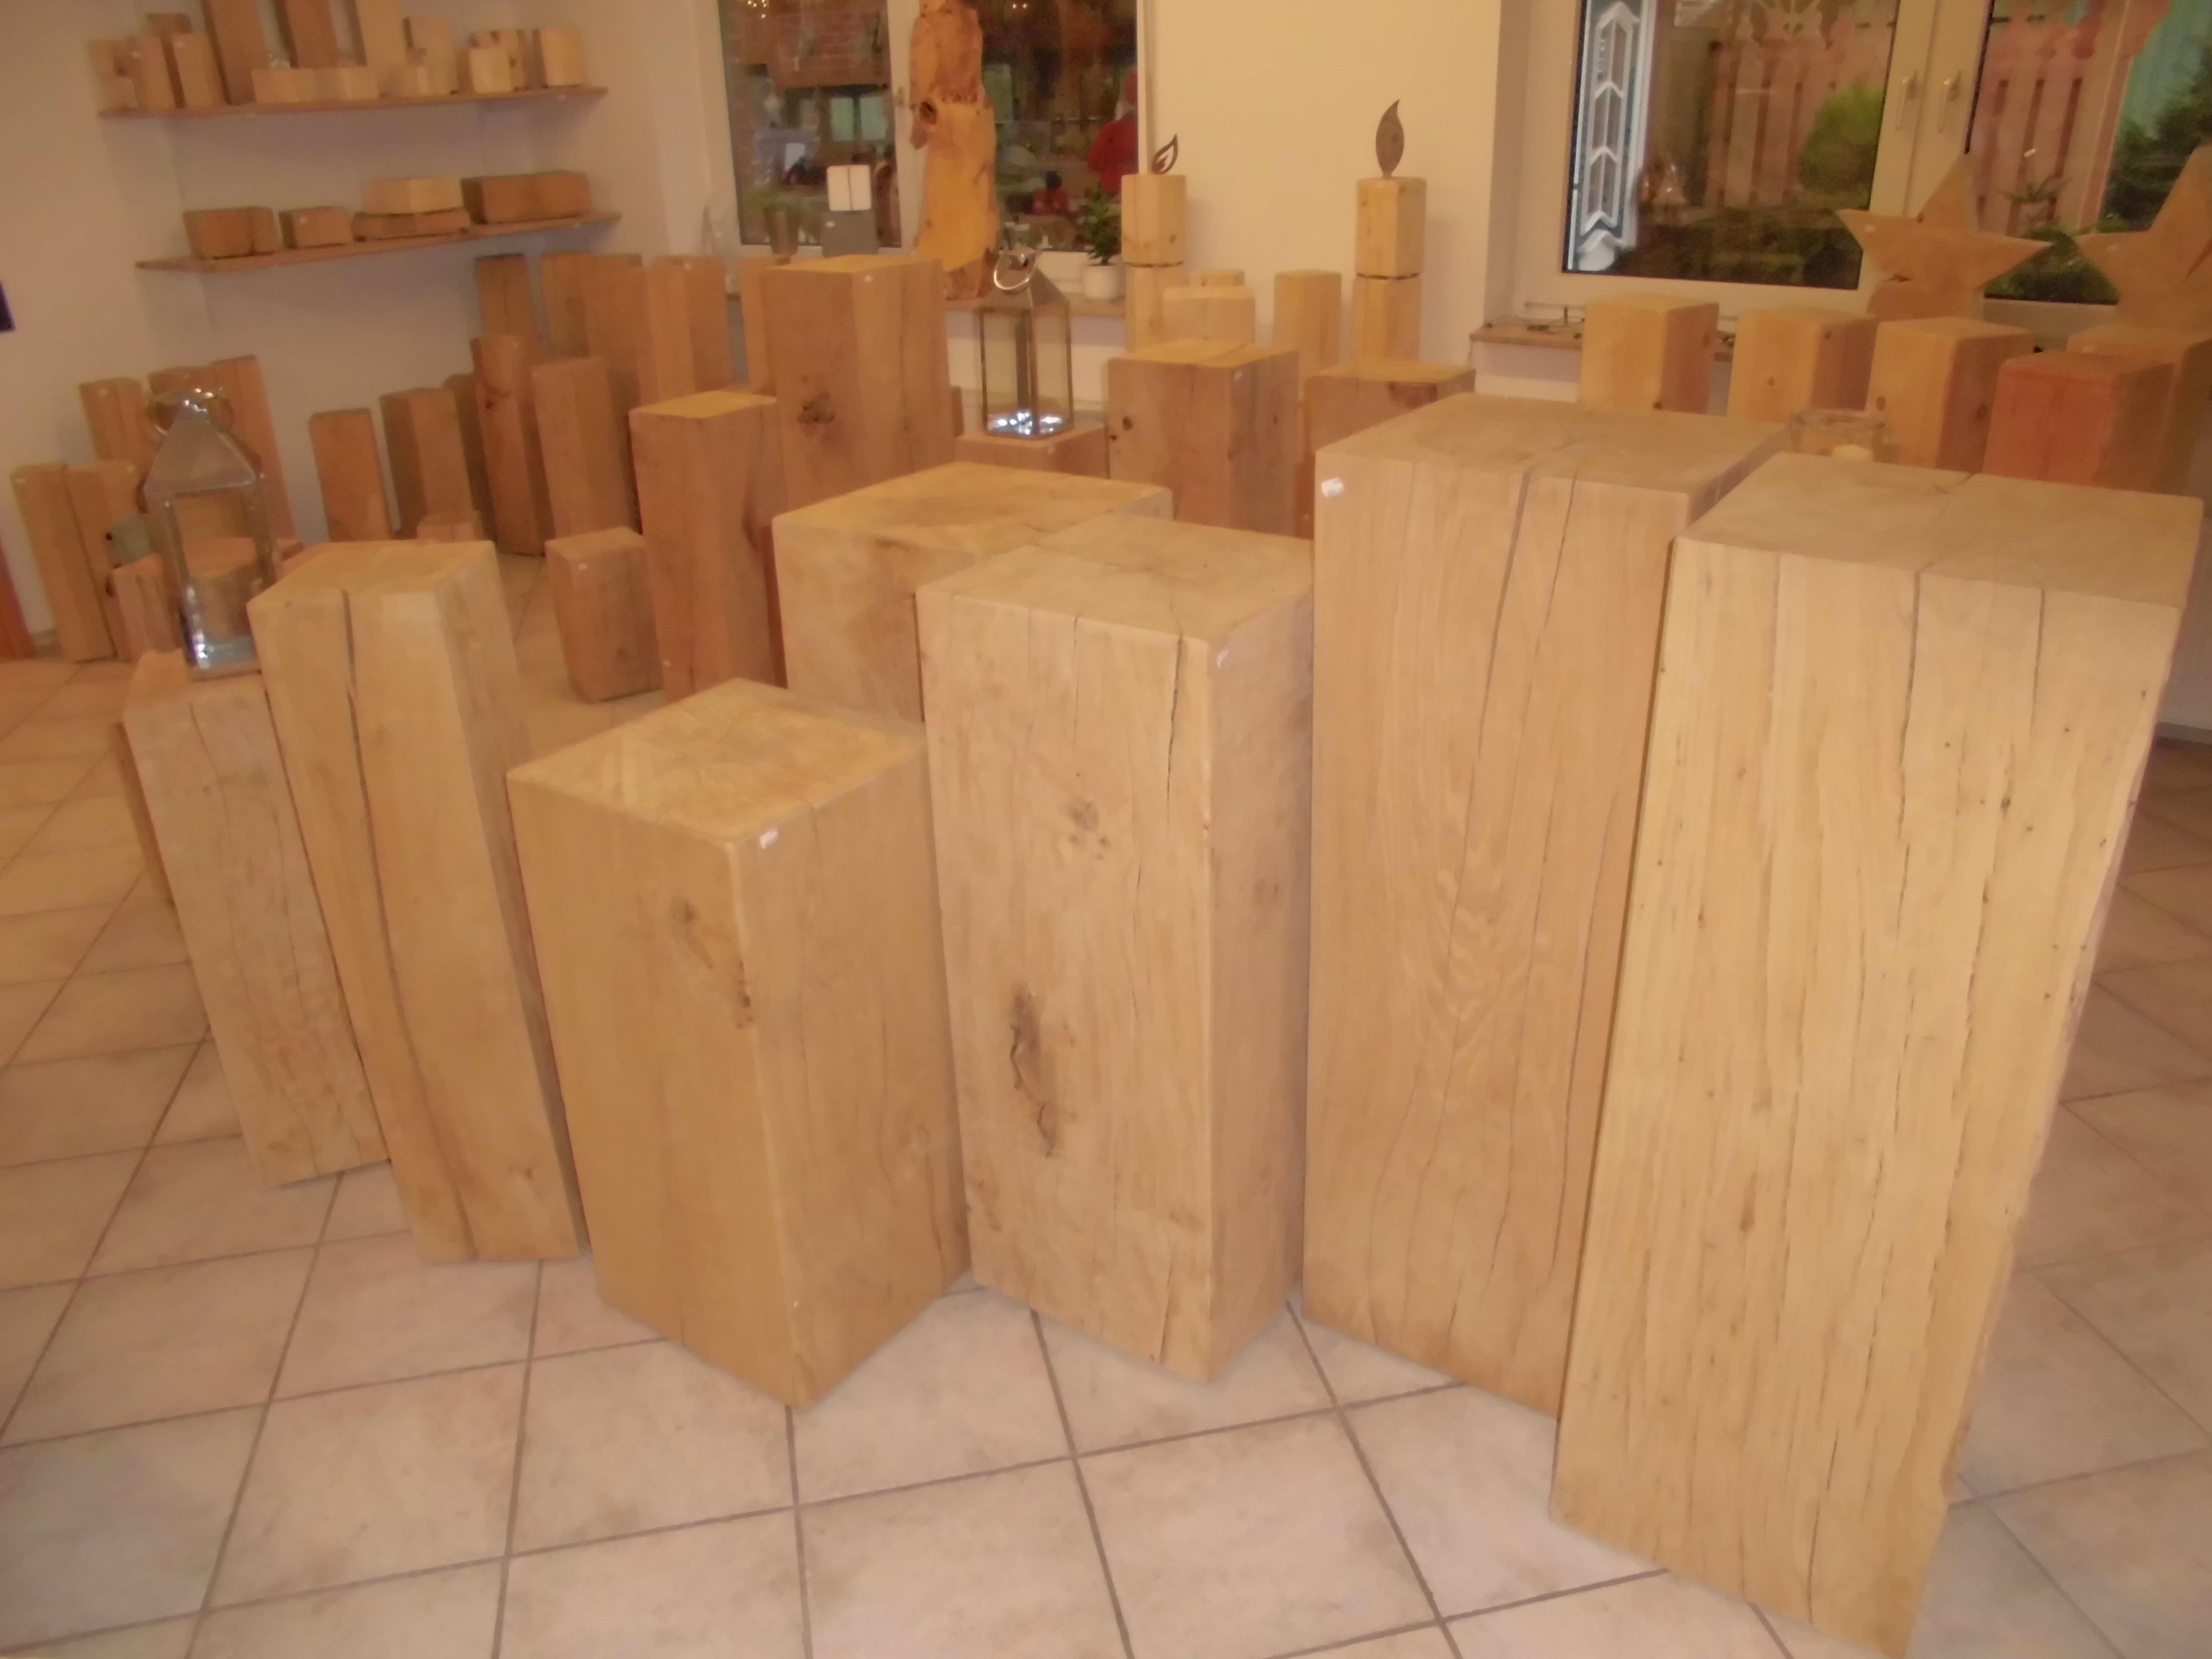 Eichenholzsäule gehobelt, geschliffen, angefast 30x30x80cm